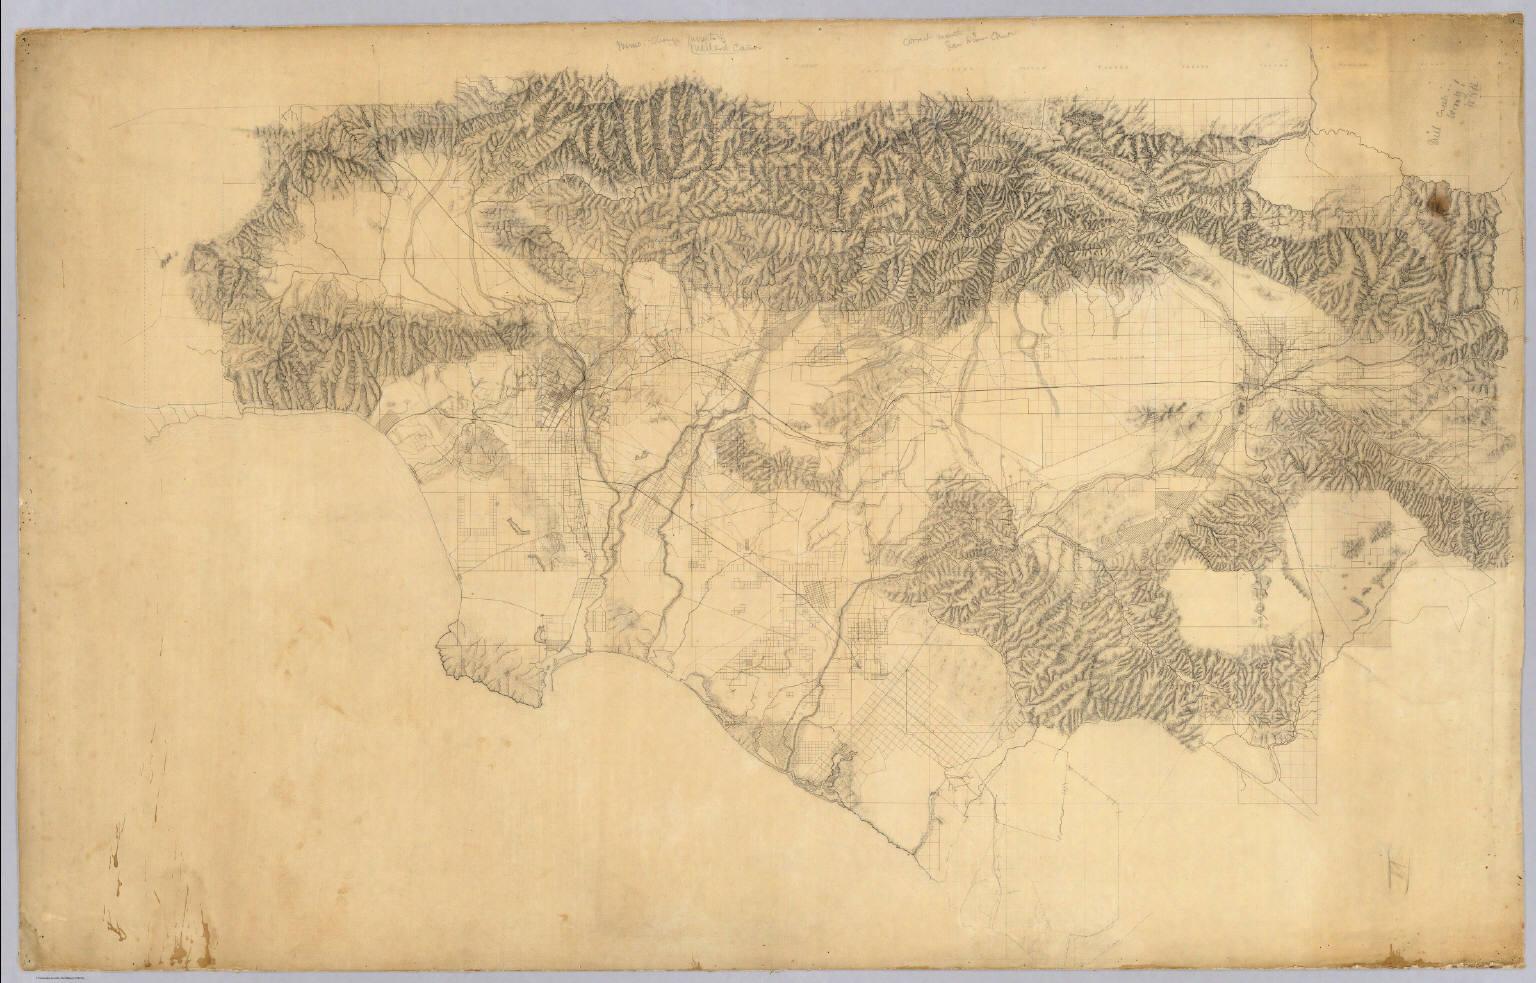 Los Angeles San Bernardino Topography David Rumsey Historical